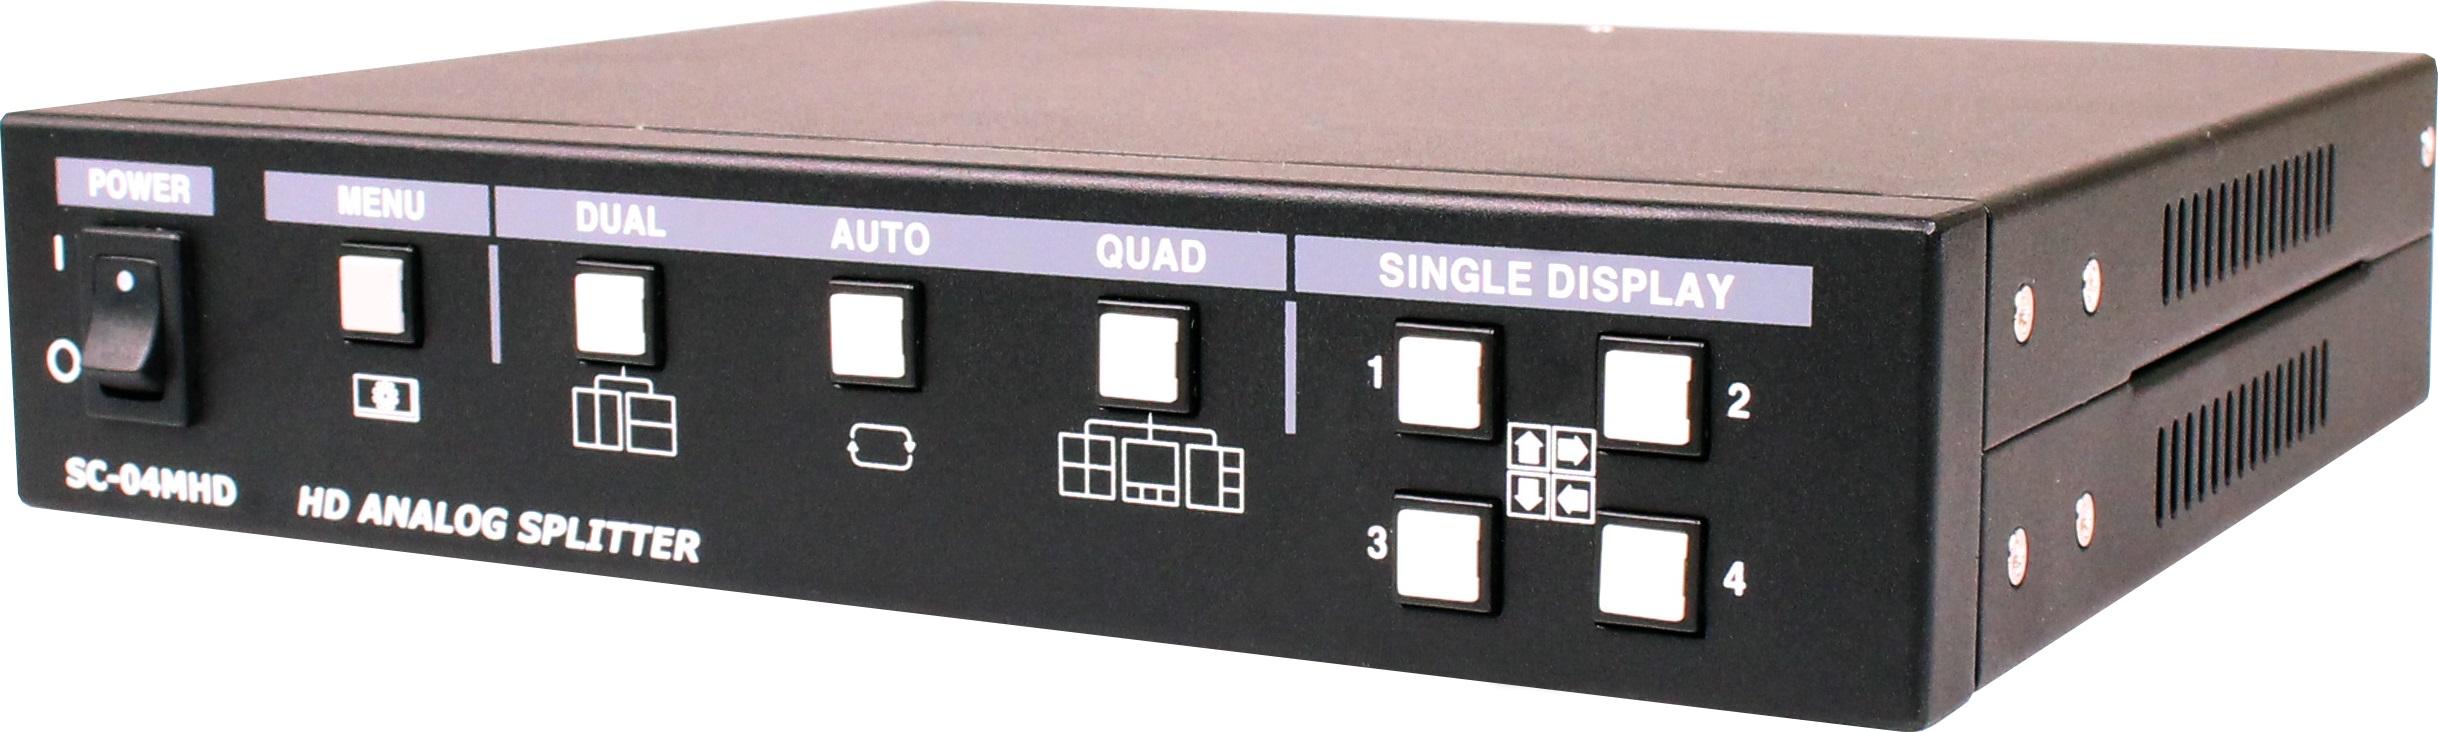 SC-04MHD_Side Image